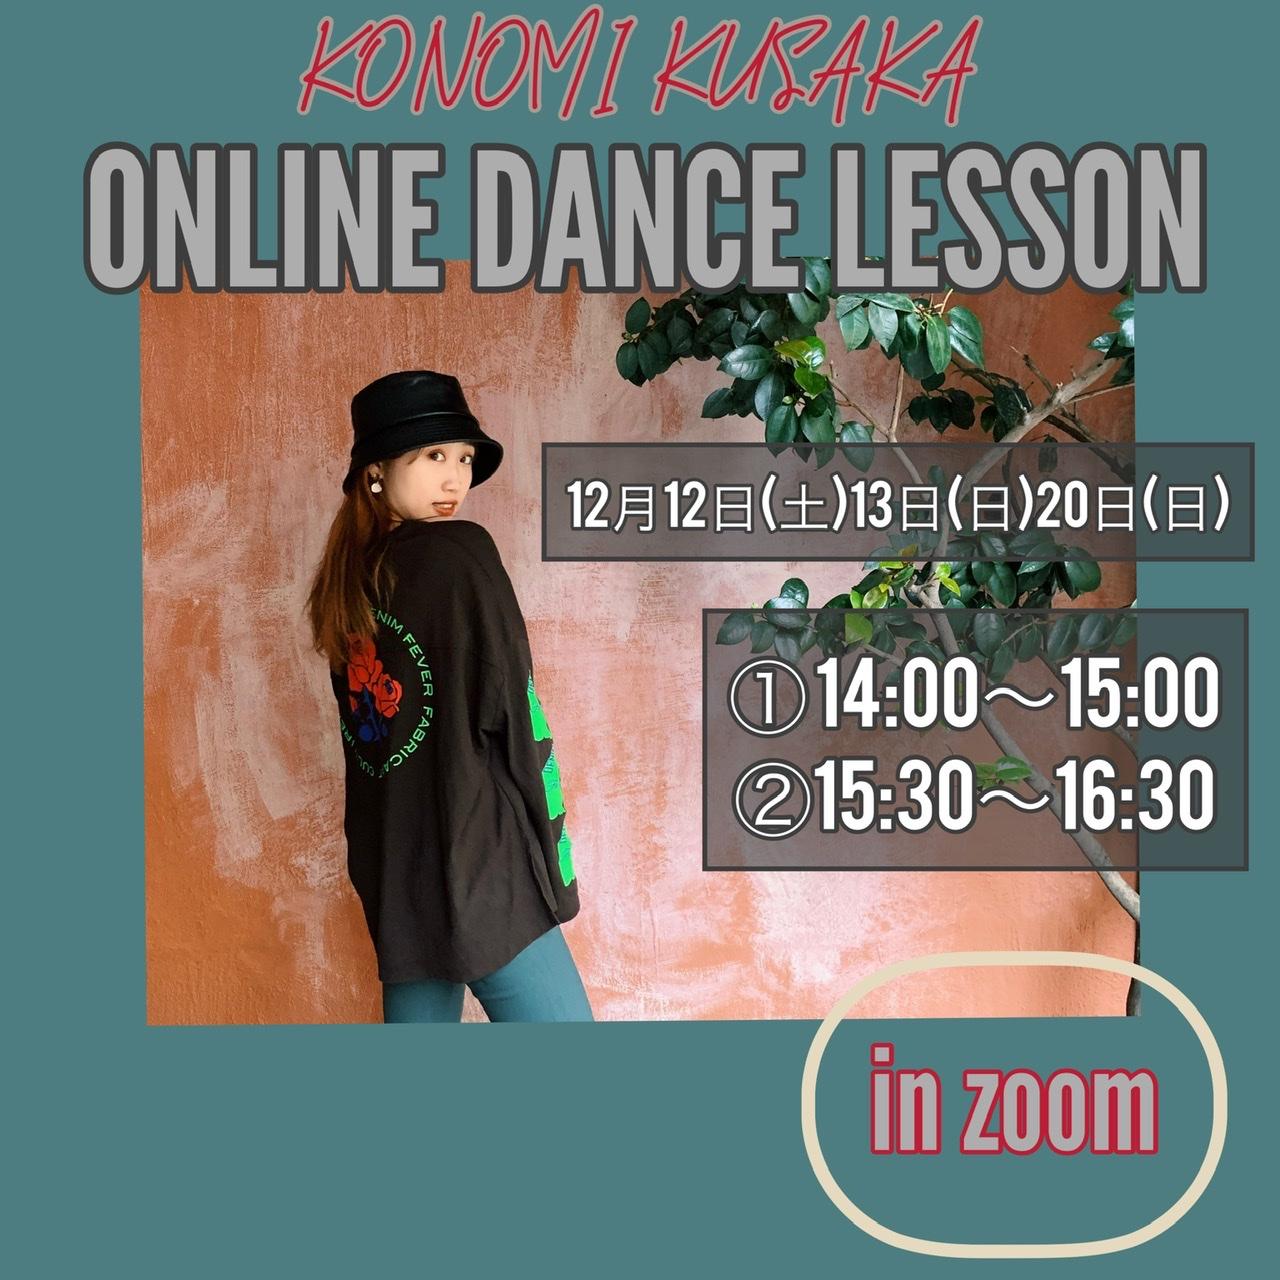 KONOMI KUSAKA  ONLINE DANCE LESSON 12/12 ②